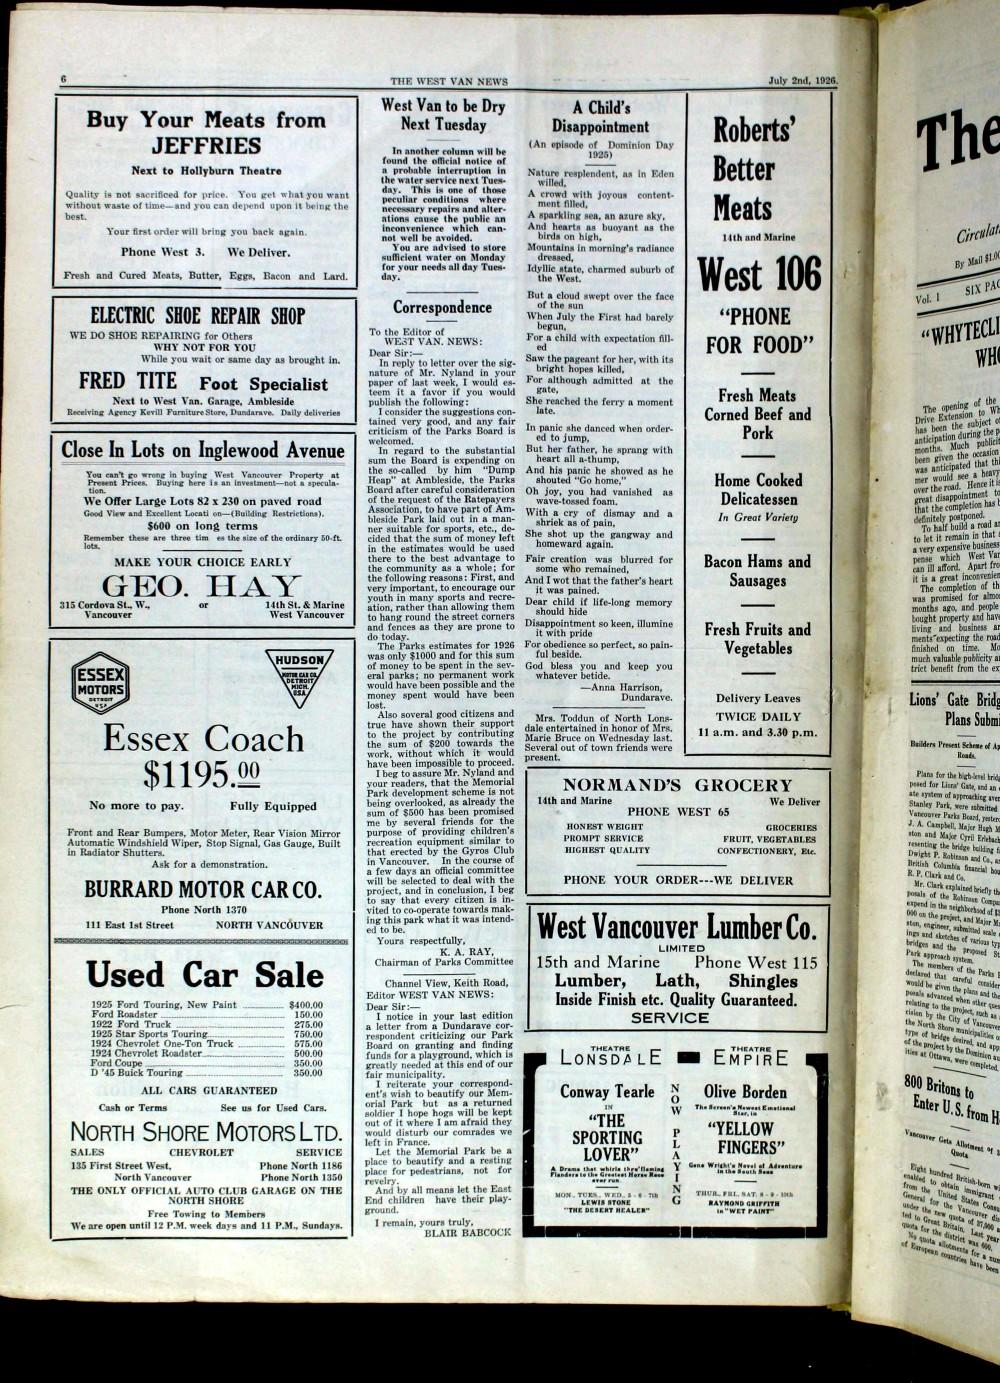 West Van. News (West Vancouver), 2 Jul 1926